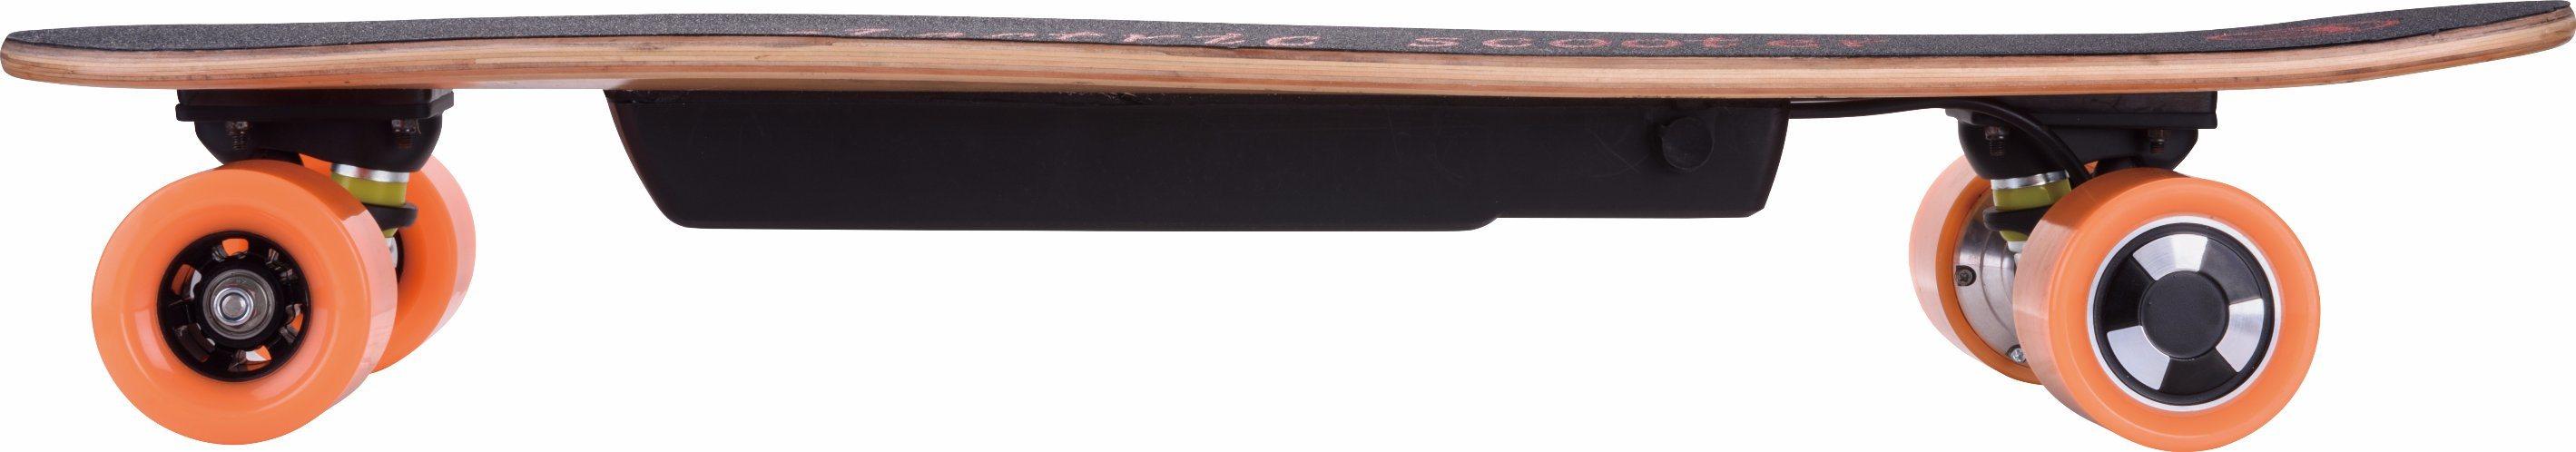 Longboard Four Wheel Electric Skateboard with Ce